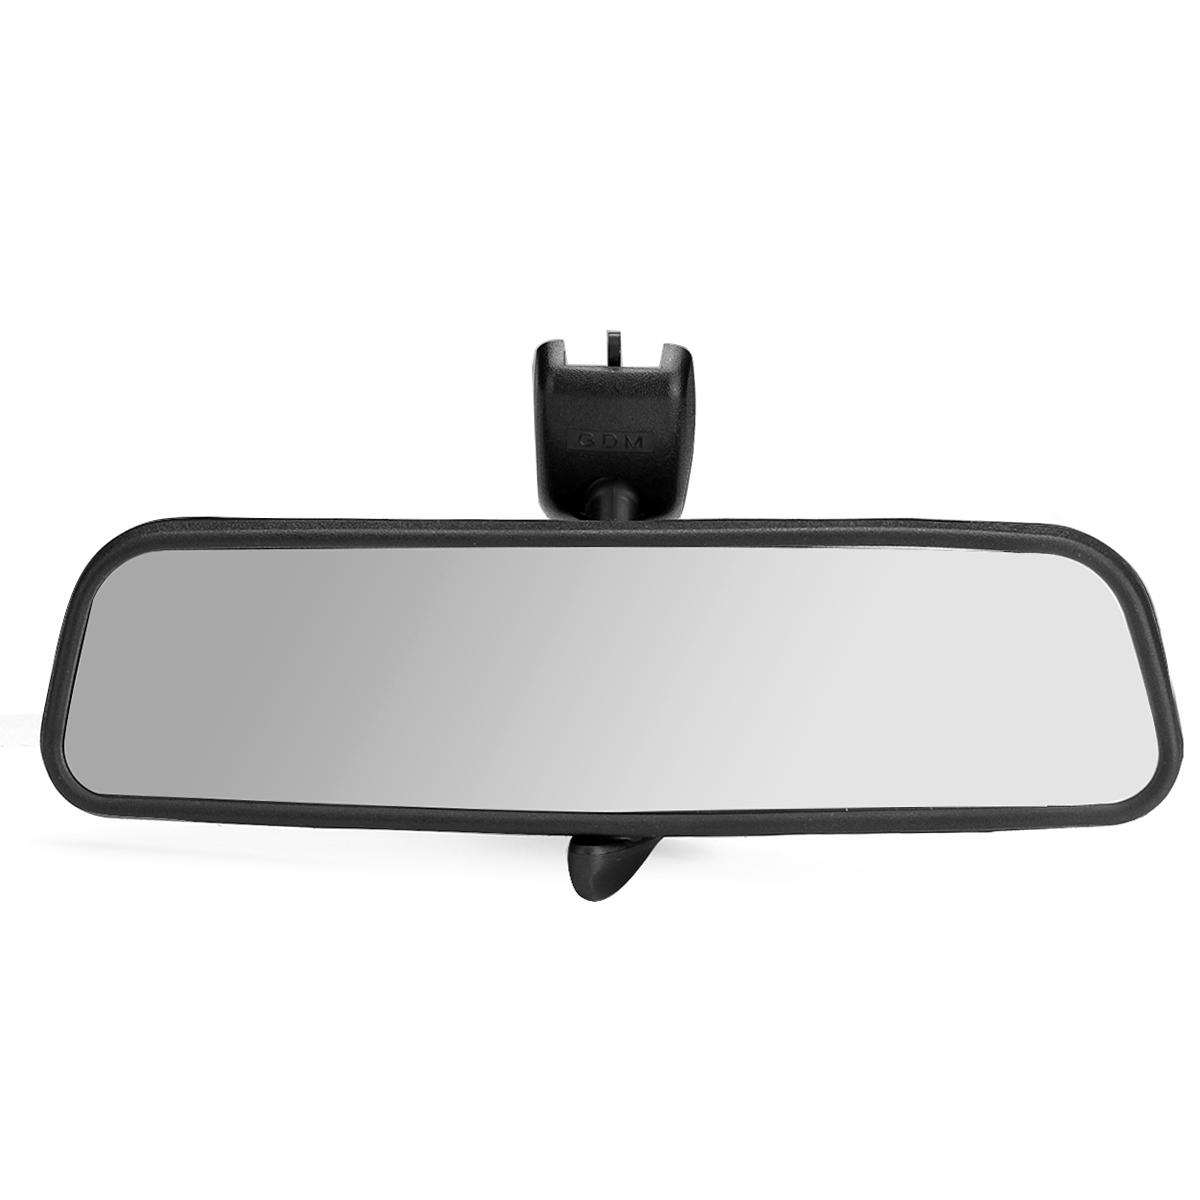 Universal 260mm Wide Flat Car Truck Mirror Interior Rear View Mirror Suction